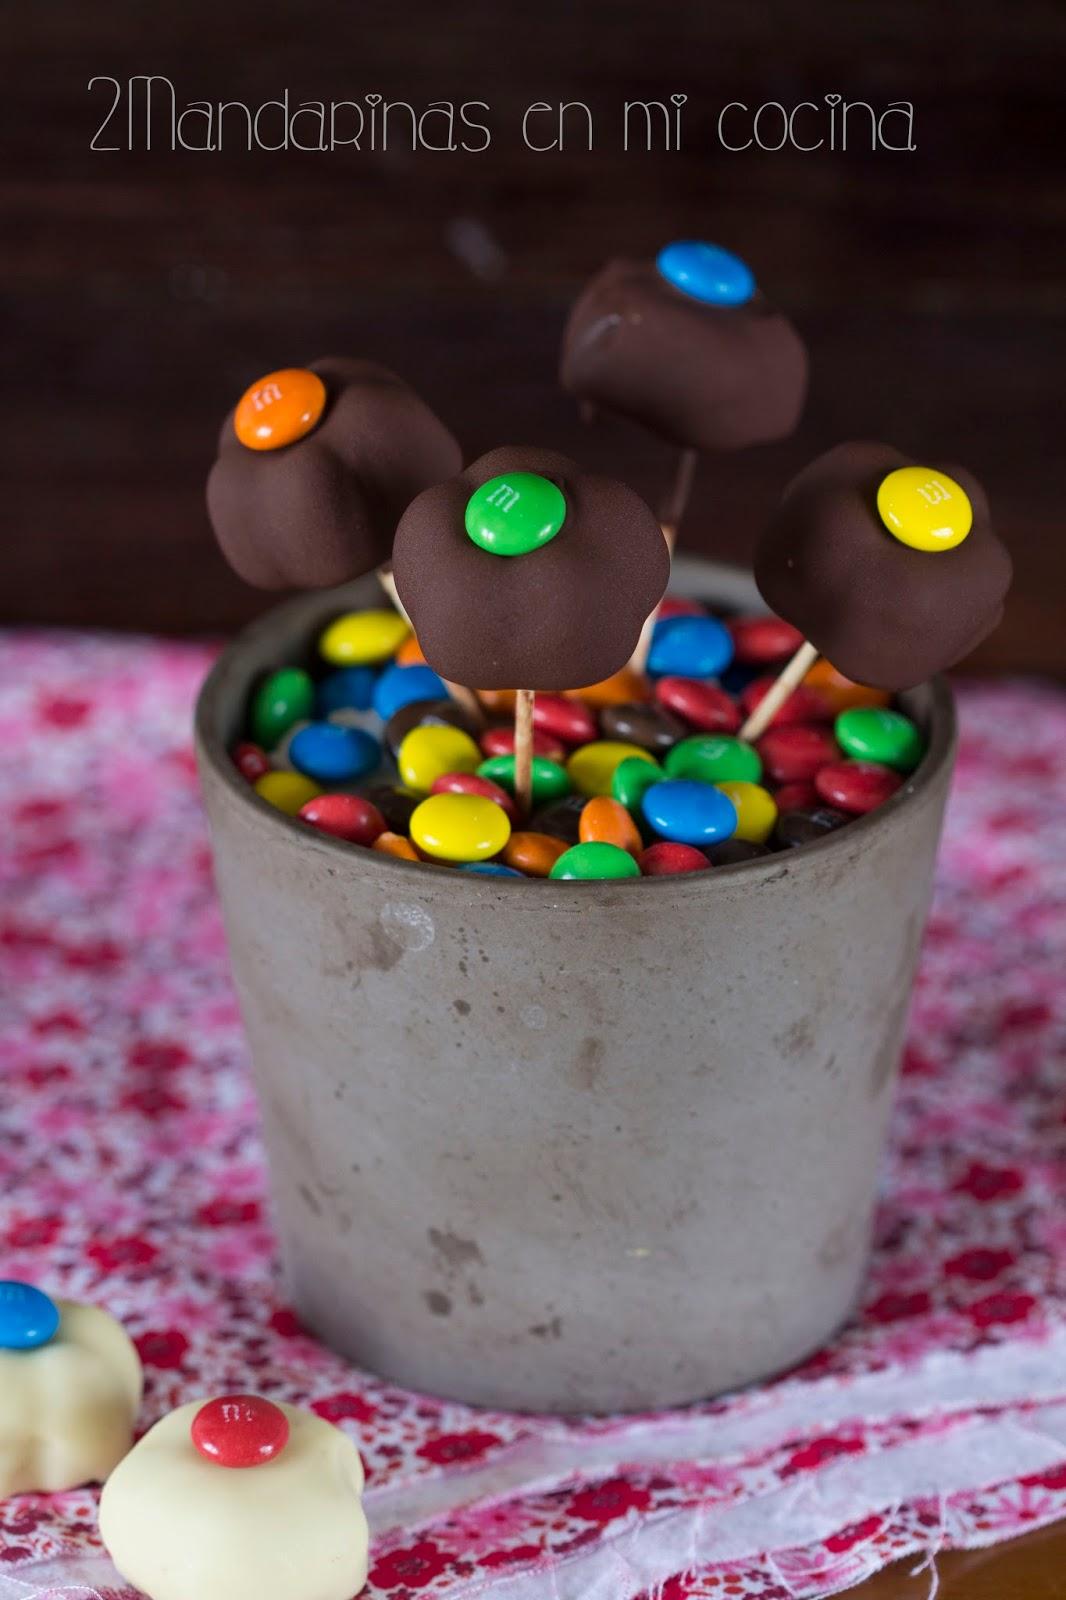 http://www.2mandarinasenmicocina.com/2014/04/bombones-de-mousse-de-chocolate-en.html